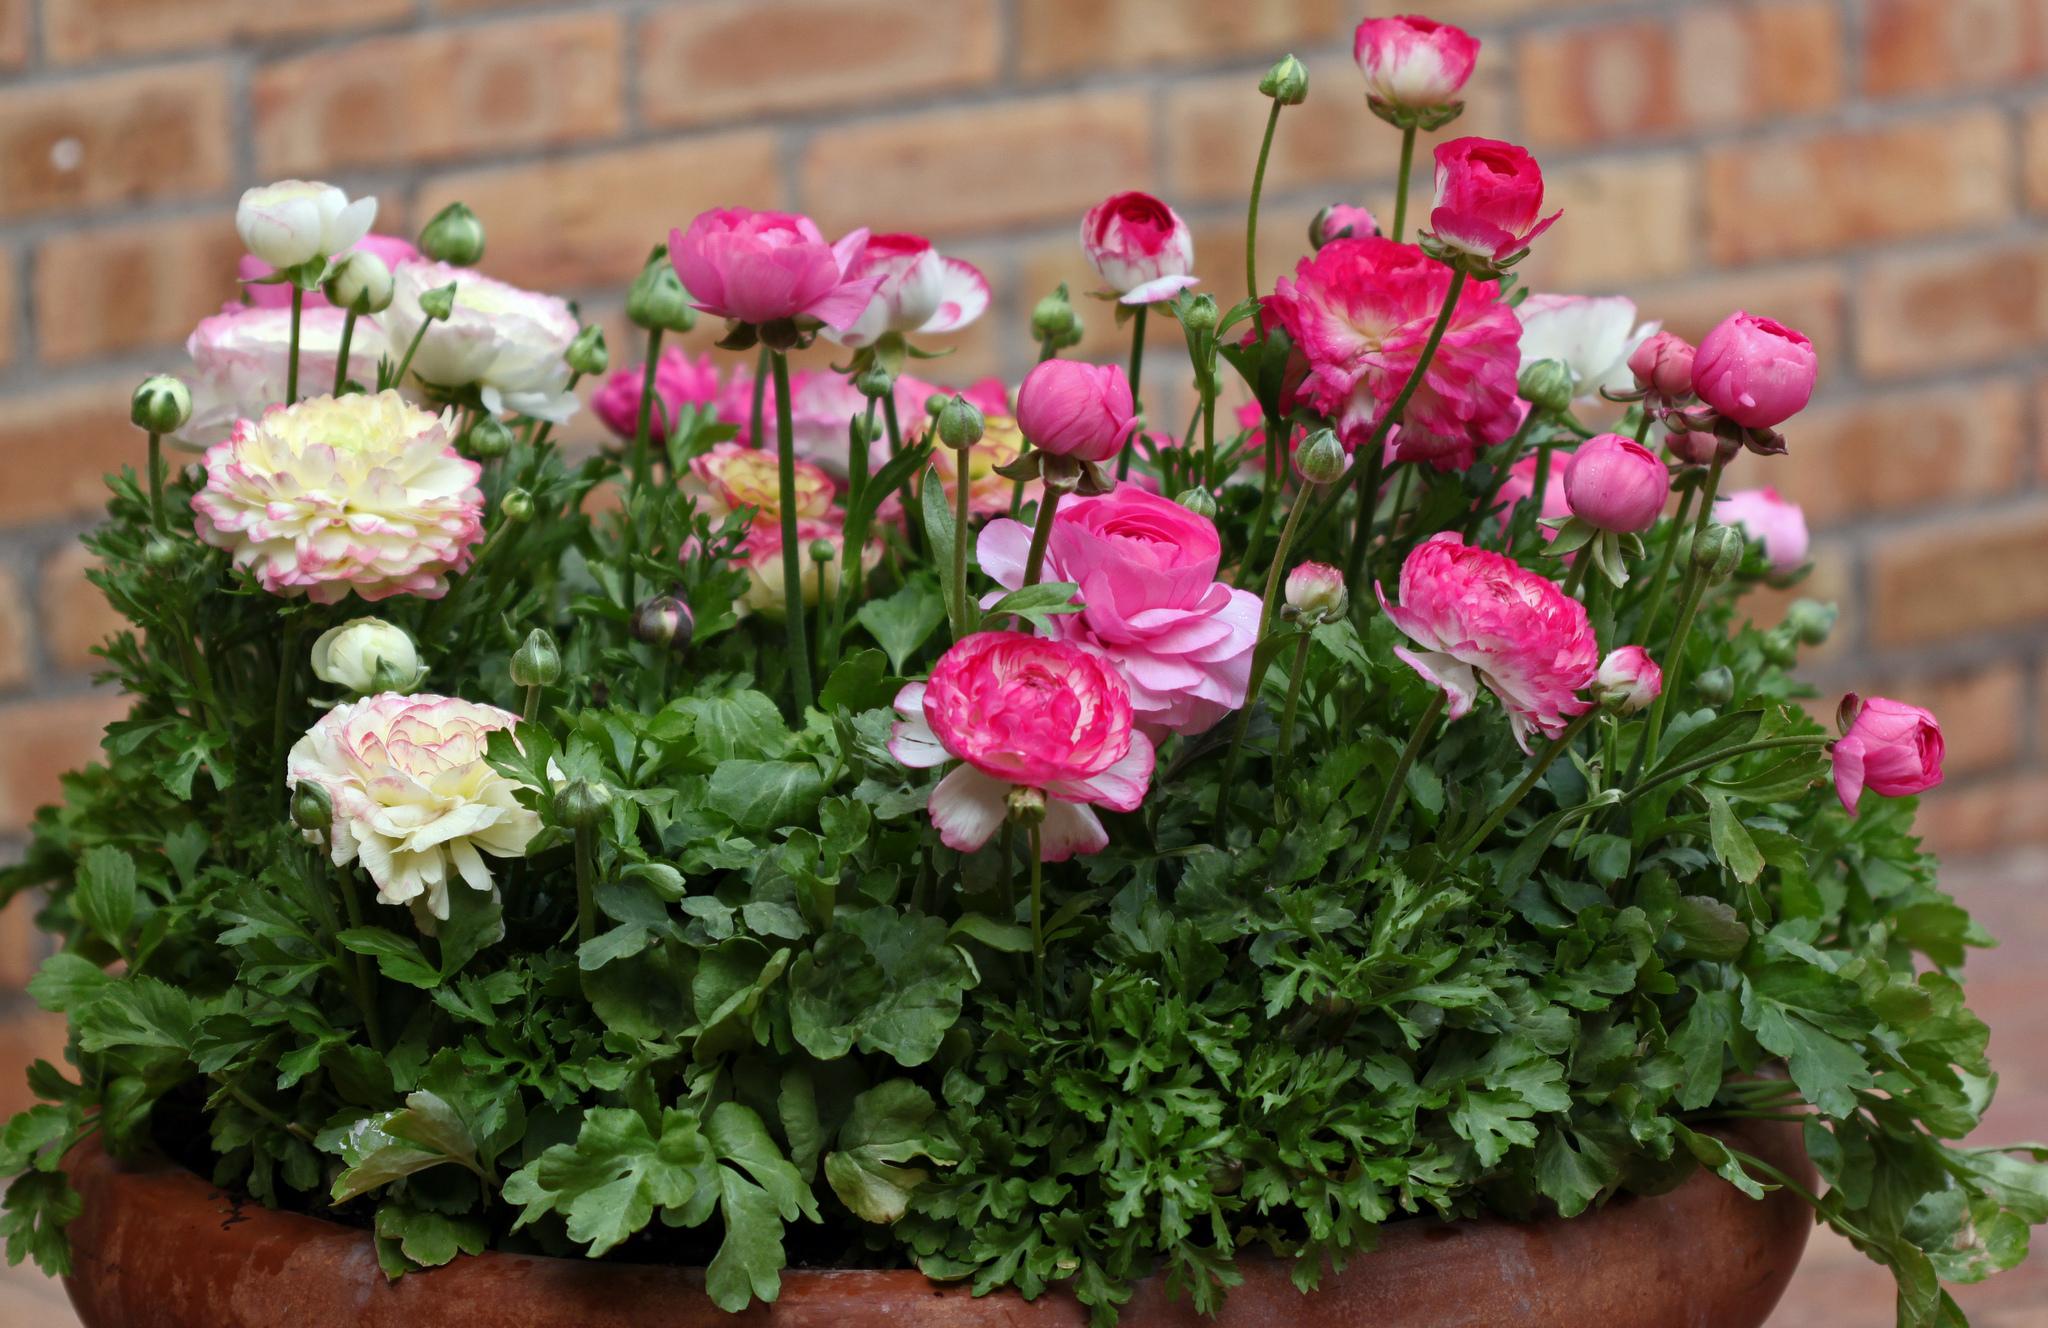 Цветок ранункулюс – уход и посадка фото ранункулюса, выращивание ранункулюс в домашних условиях